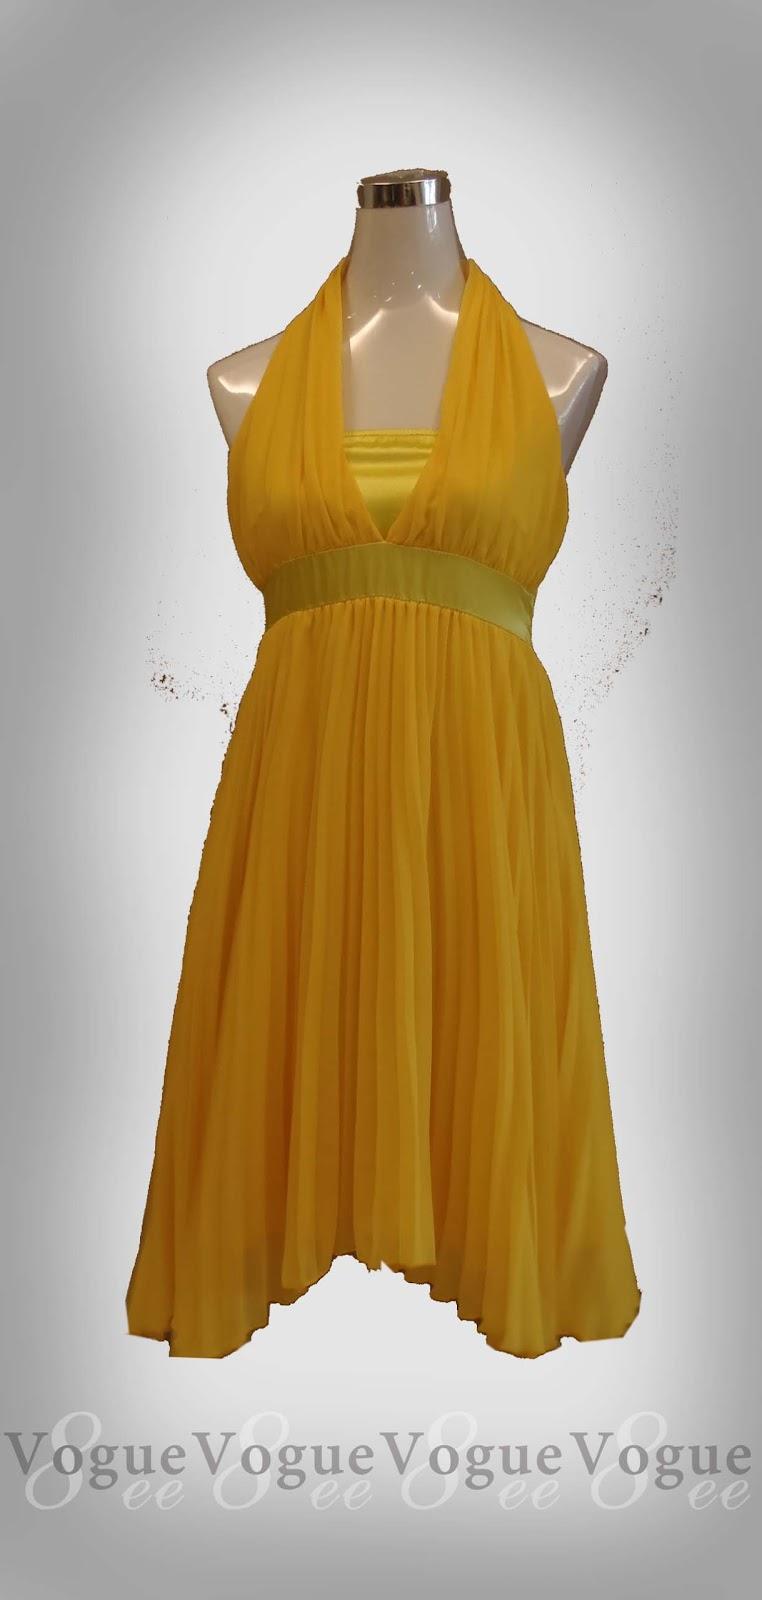 6389b4a5409 Vogue8ee  Marilyn Monroe Dress